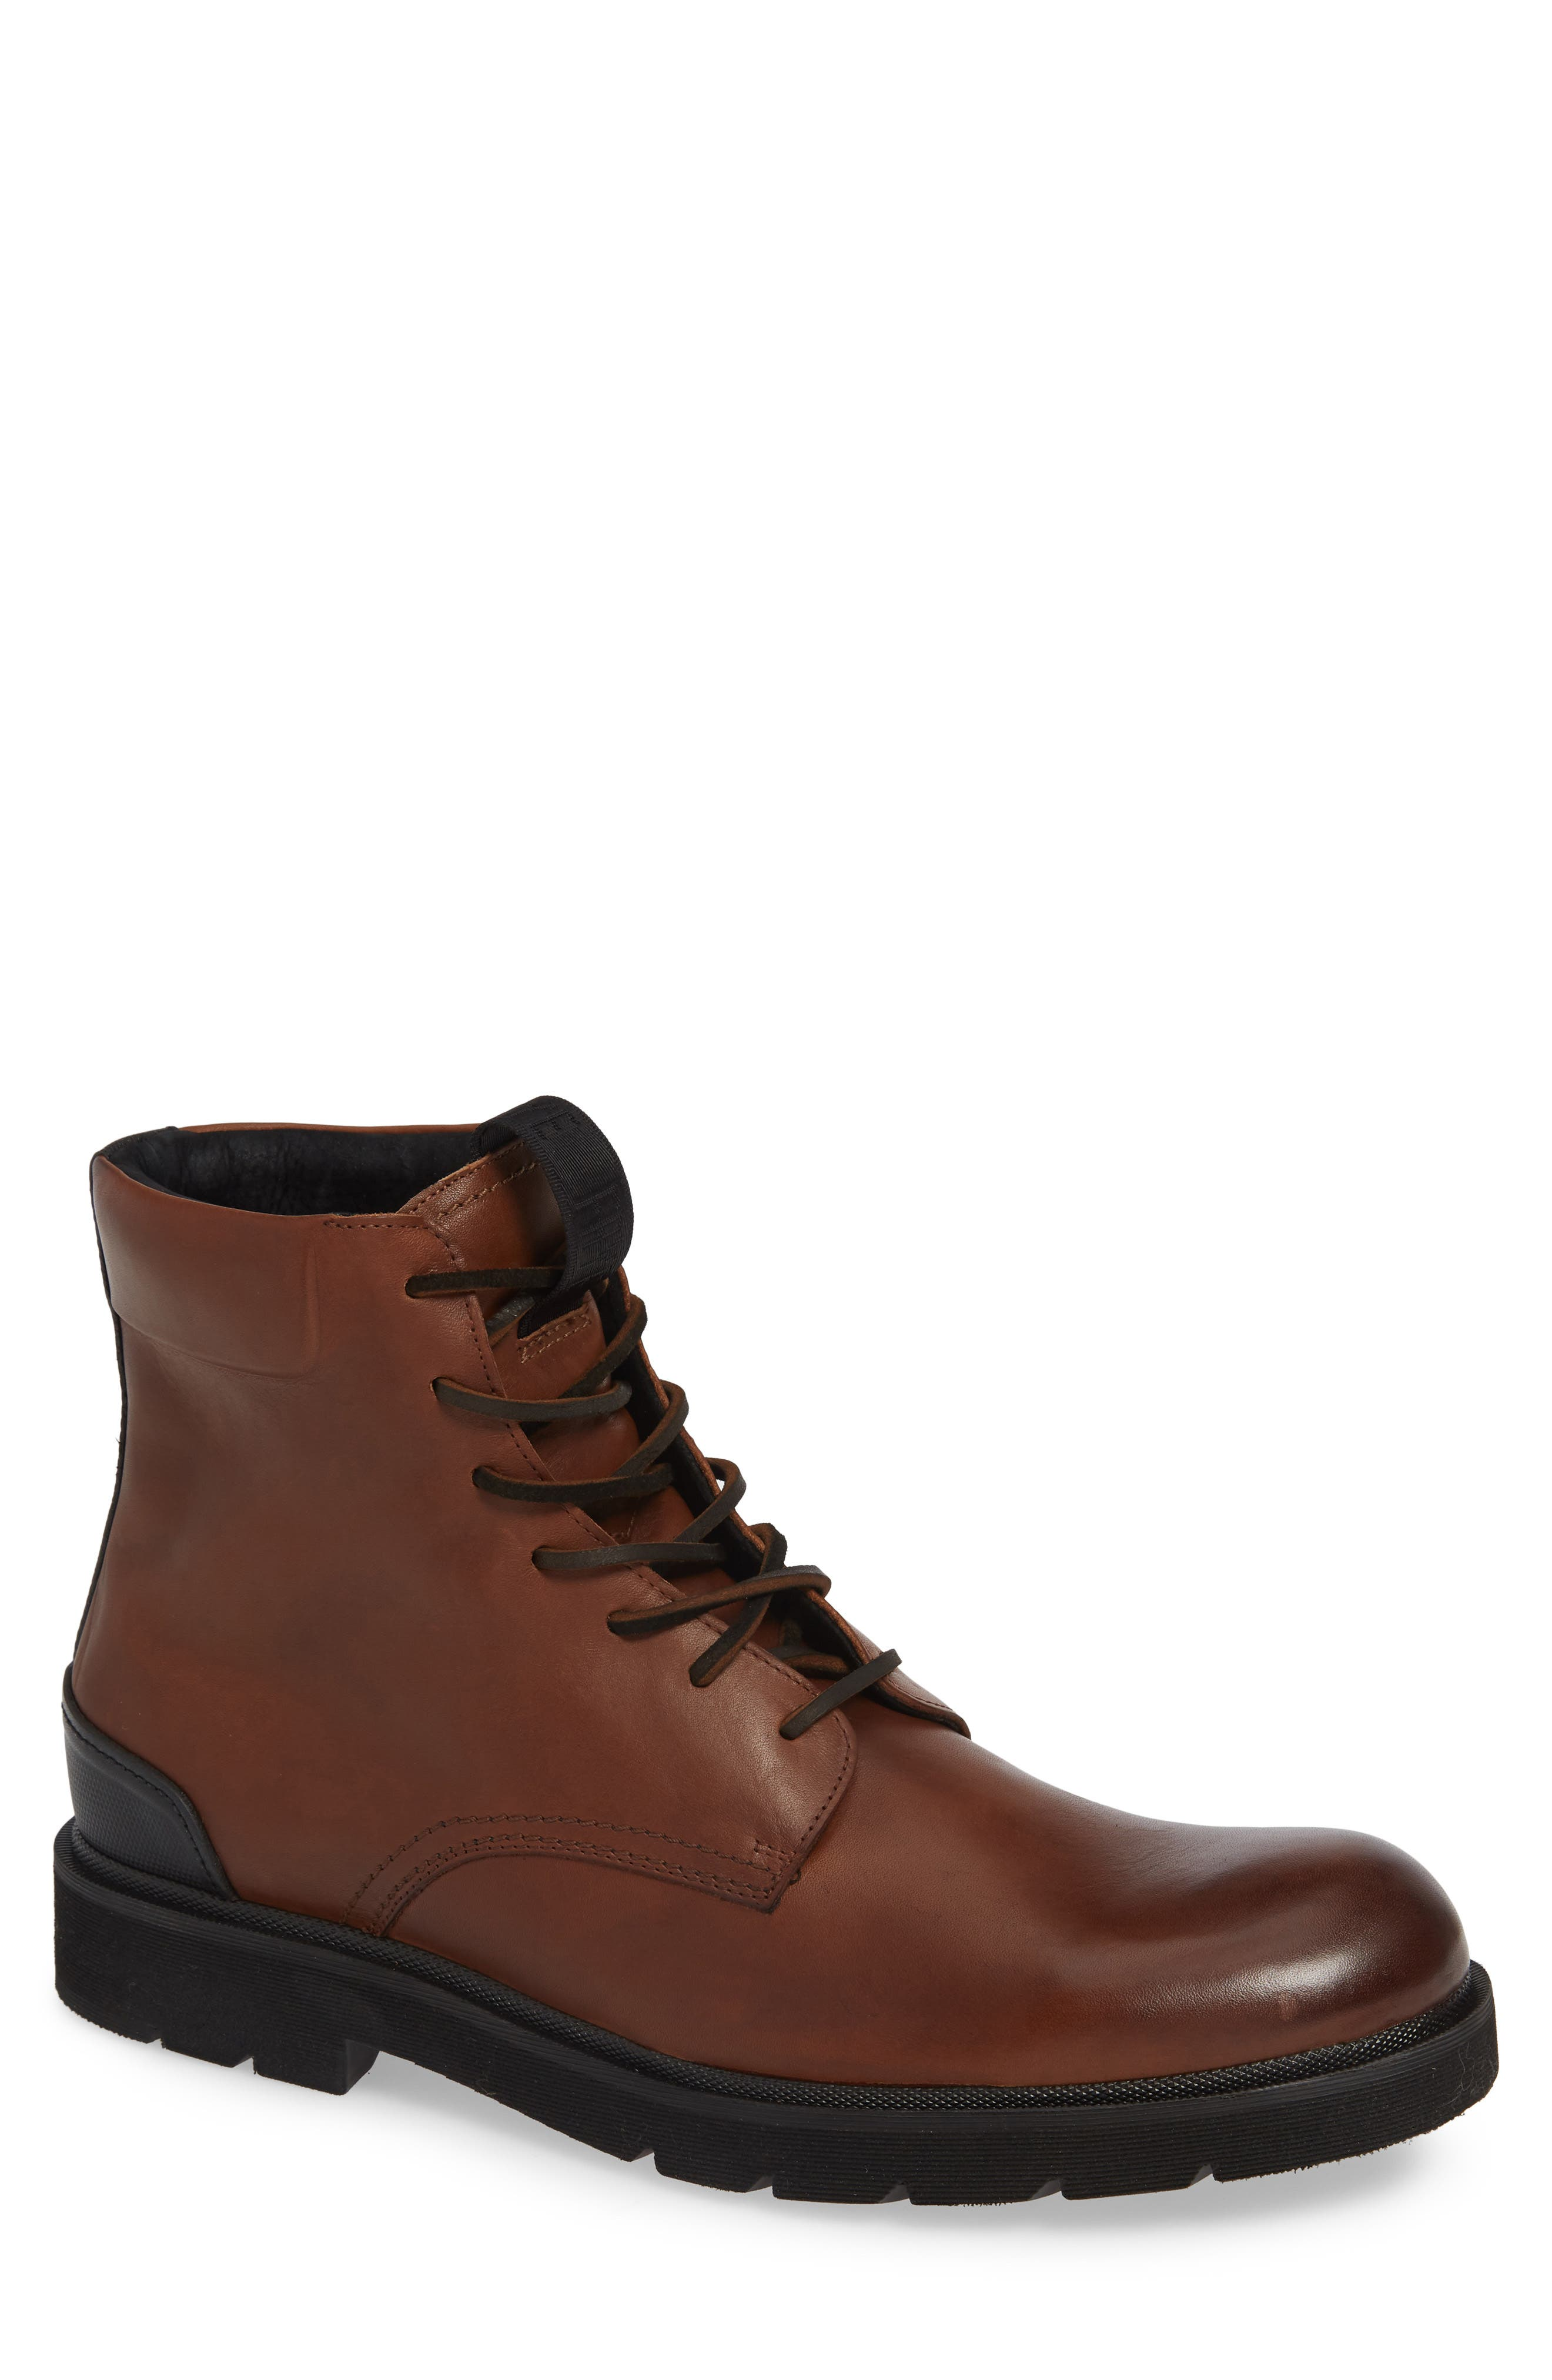 Terra Plain Toe Boot,                             Main thumbnail 1, color,                             235